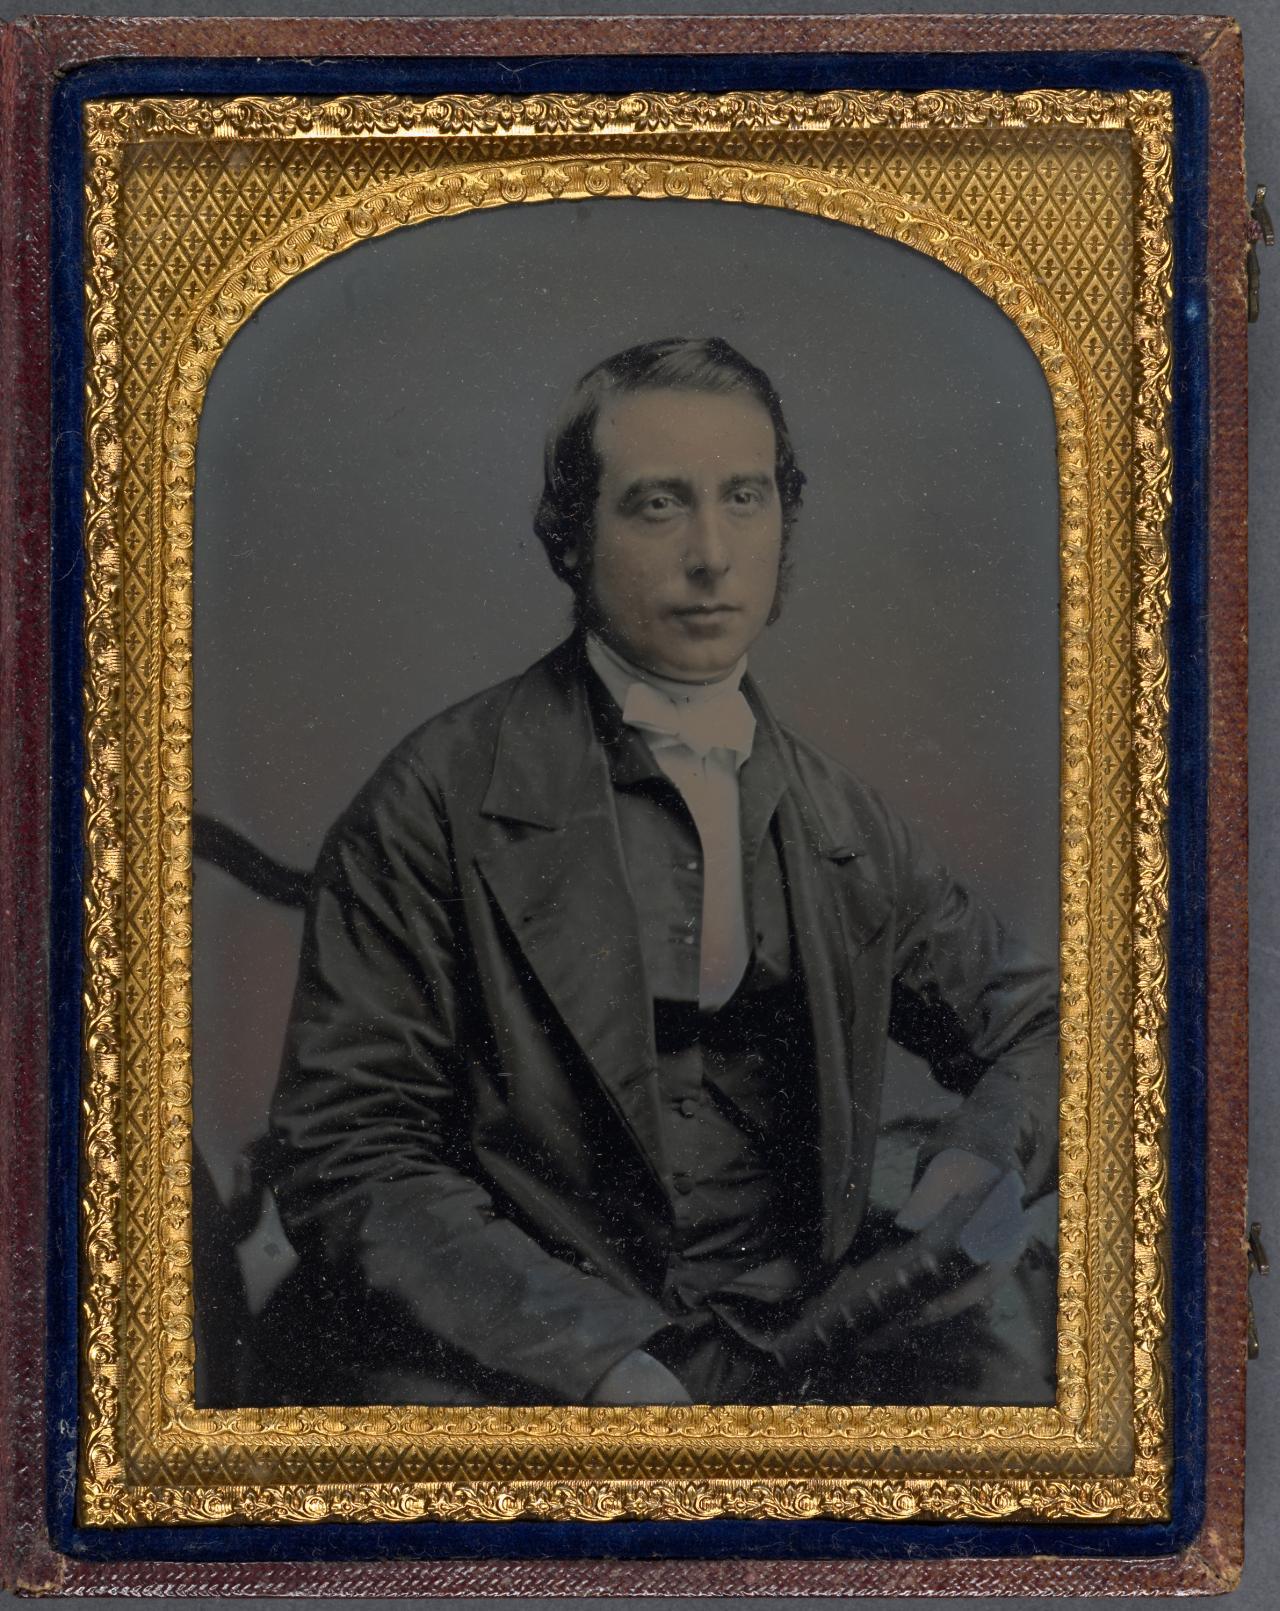 Walter Davis | FREEMAN BROTHERS STUDIO, Sydney